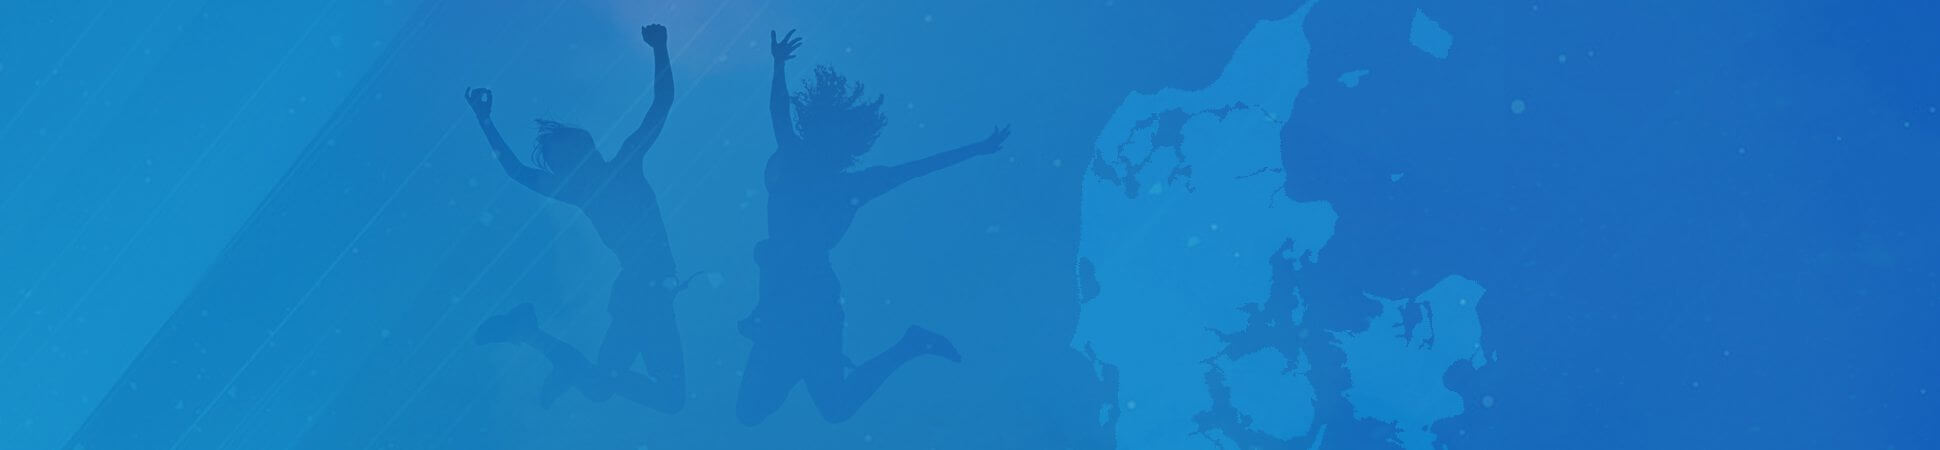 blå mandag banner baggrund